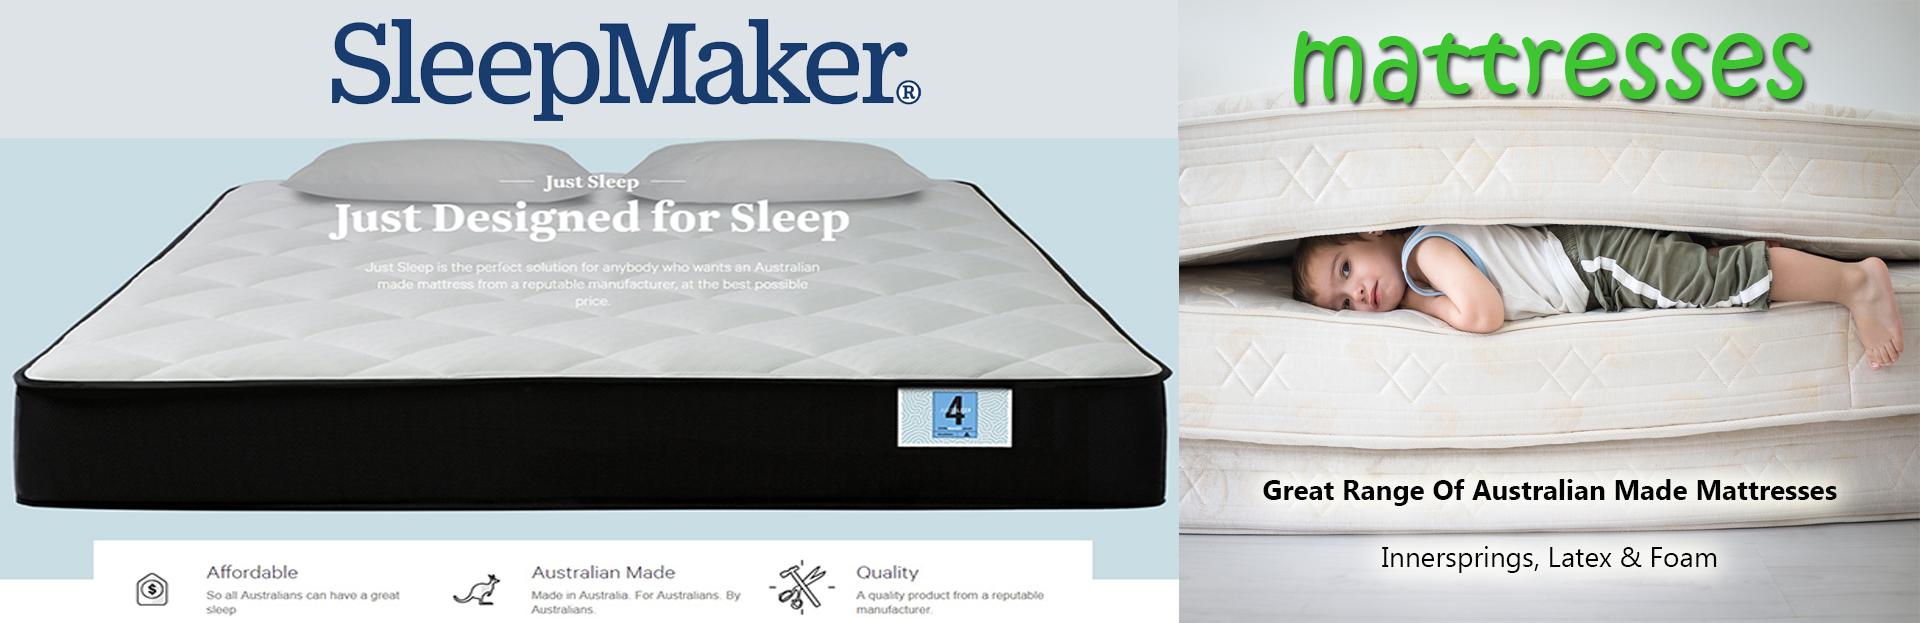 mattresses-banner-july-2018.jpg